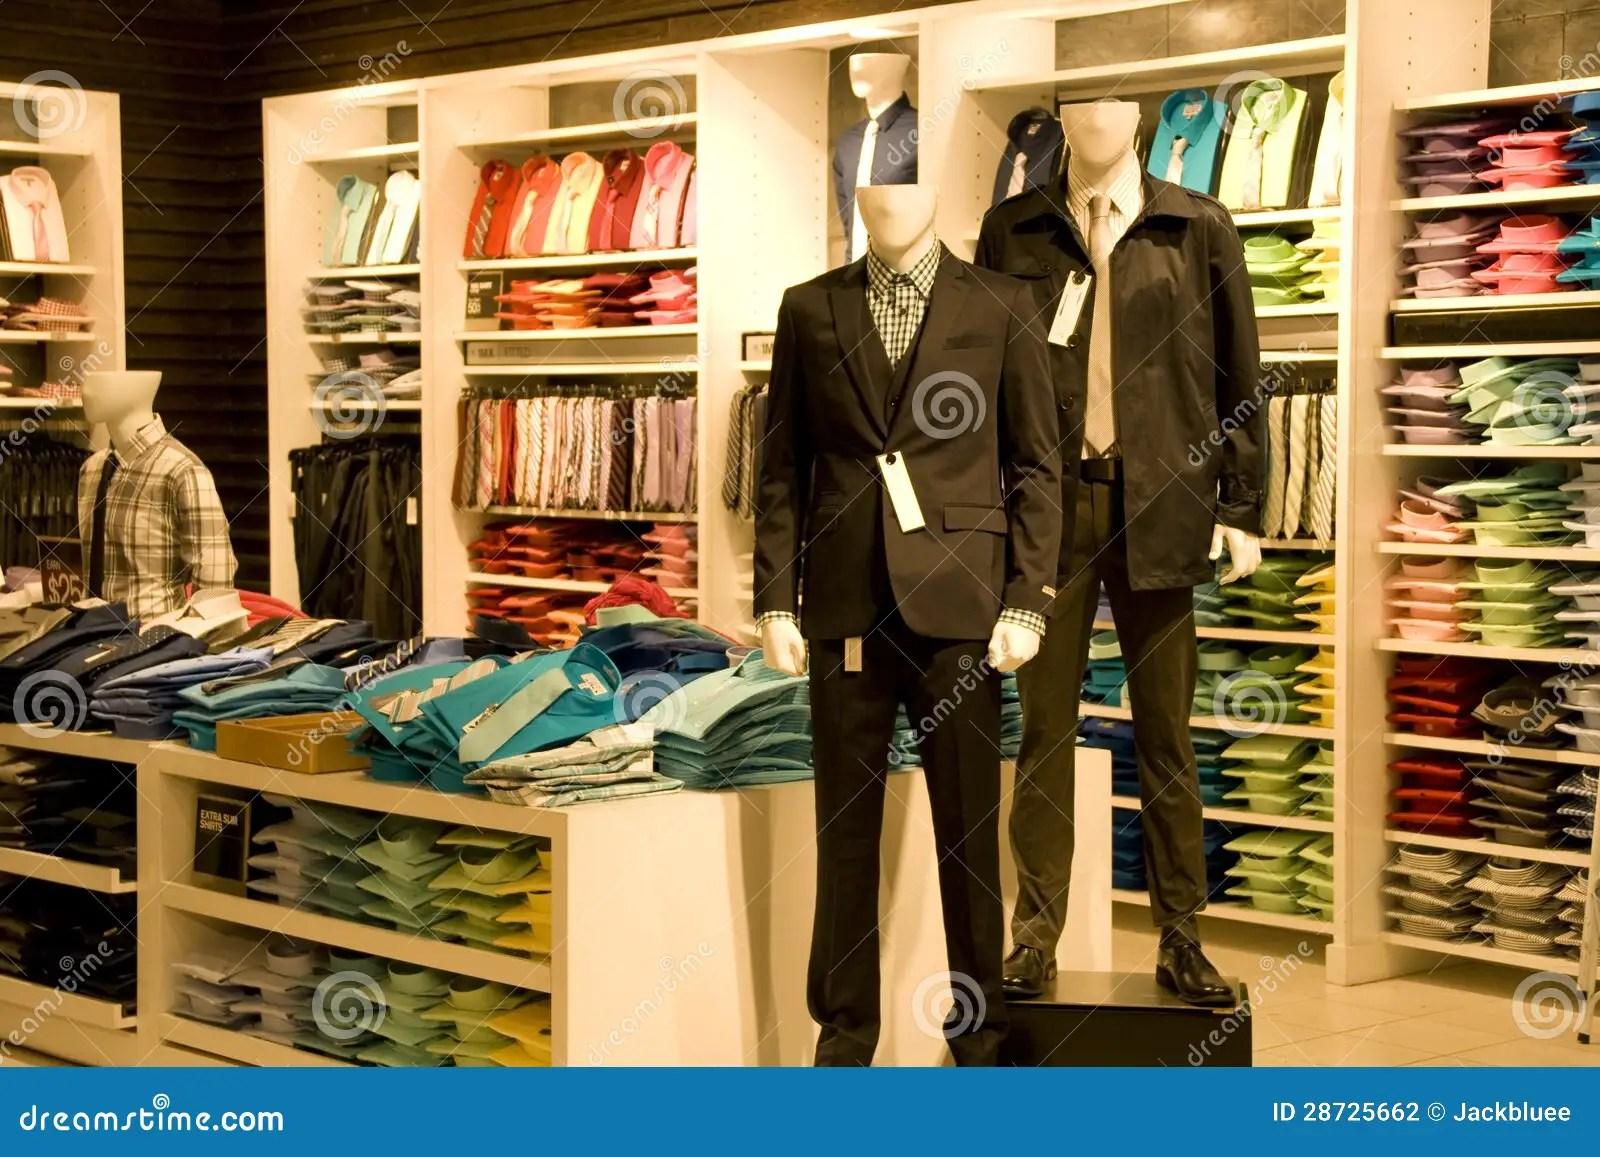 Stylish Man Clothing In Store Stock Photography  Image